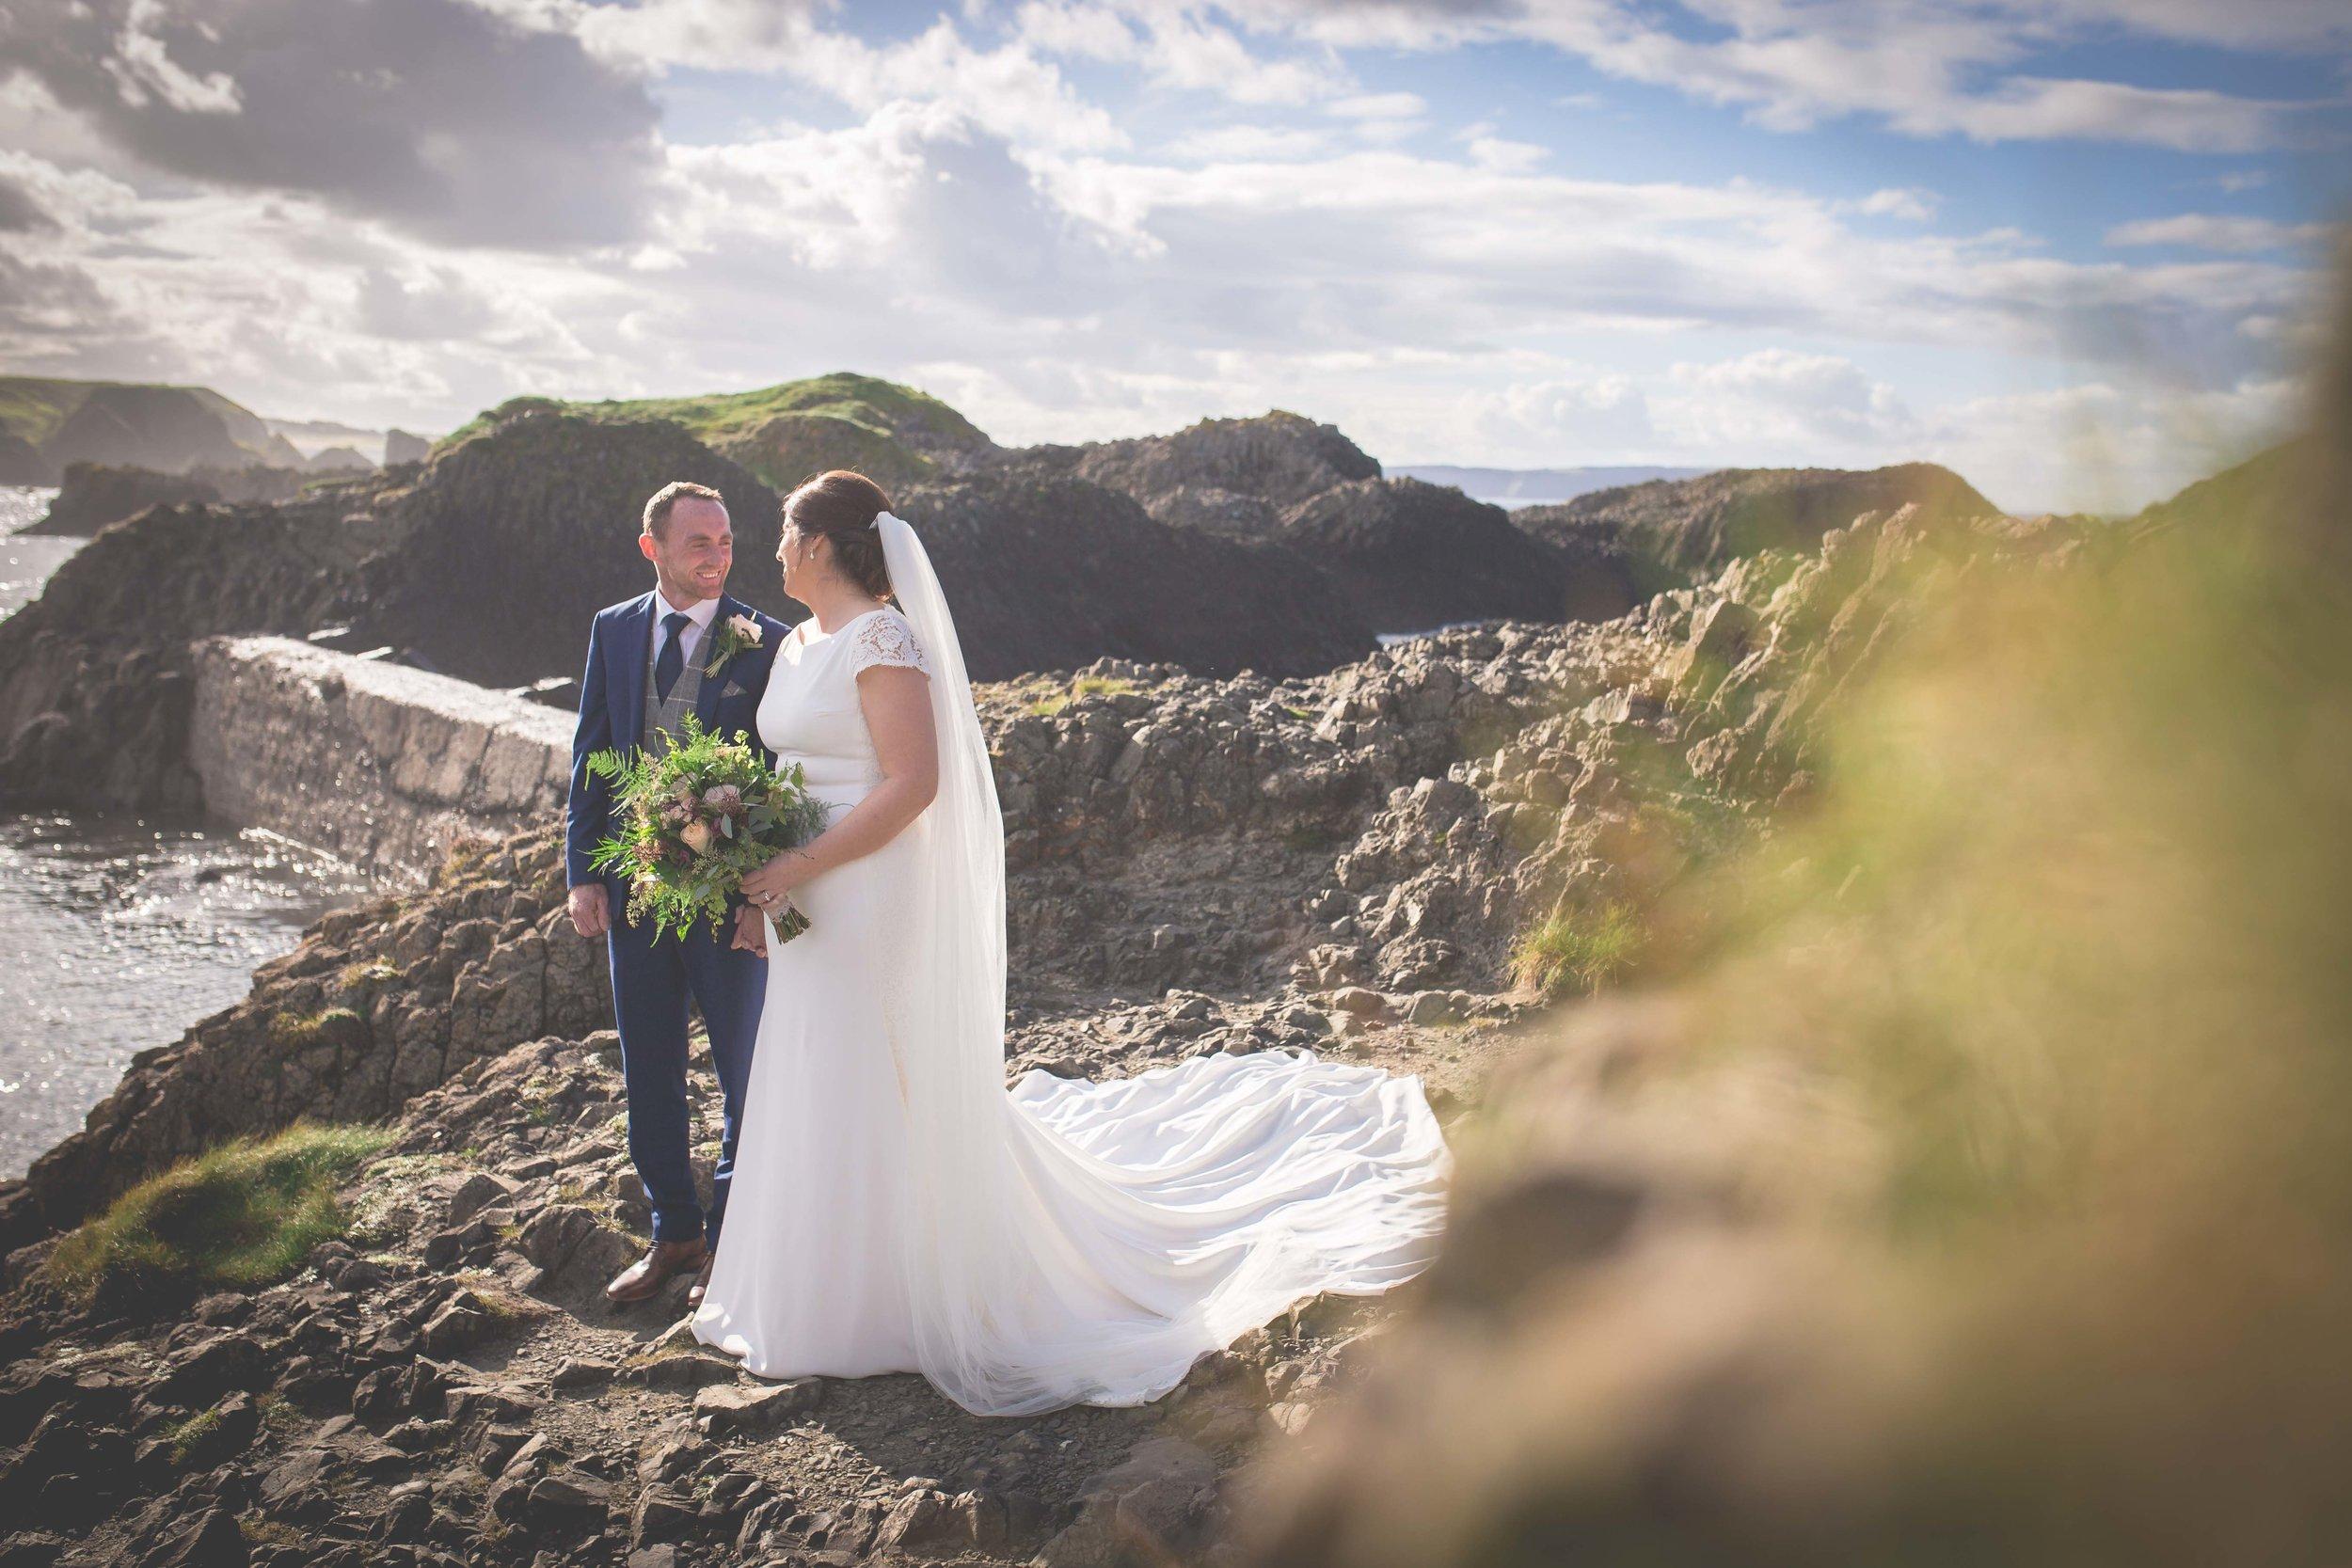 Northern Ireland Wedding Photographer   Brian McEwan Photography   Affordable Wedding Photography Throughout Antrim Down Armagh Tyrone Londonderry Derry Down Fermanagh -65.jpg